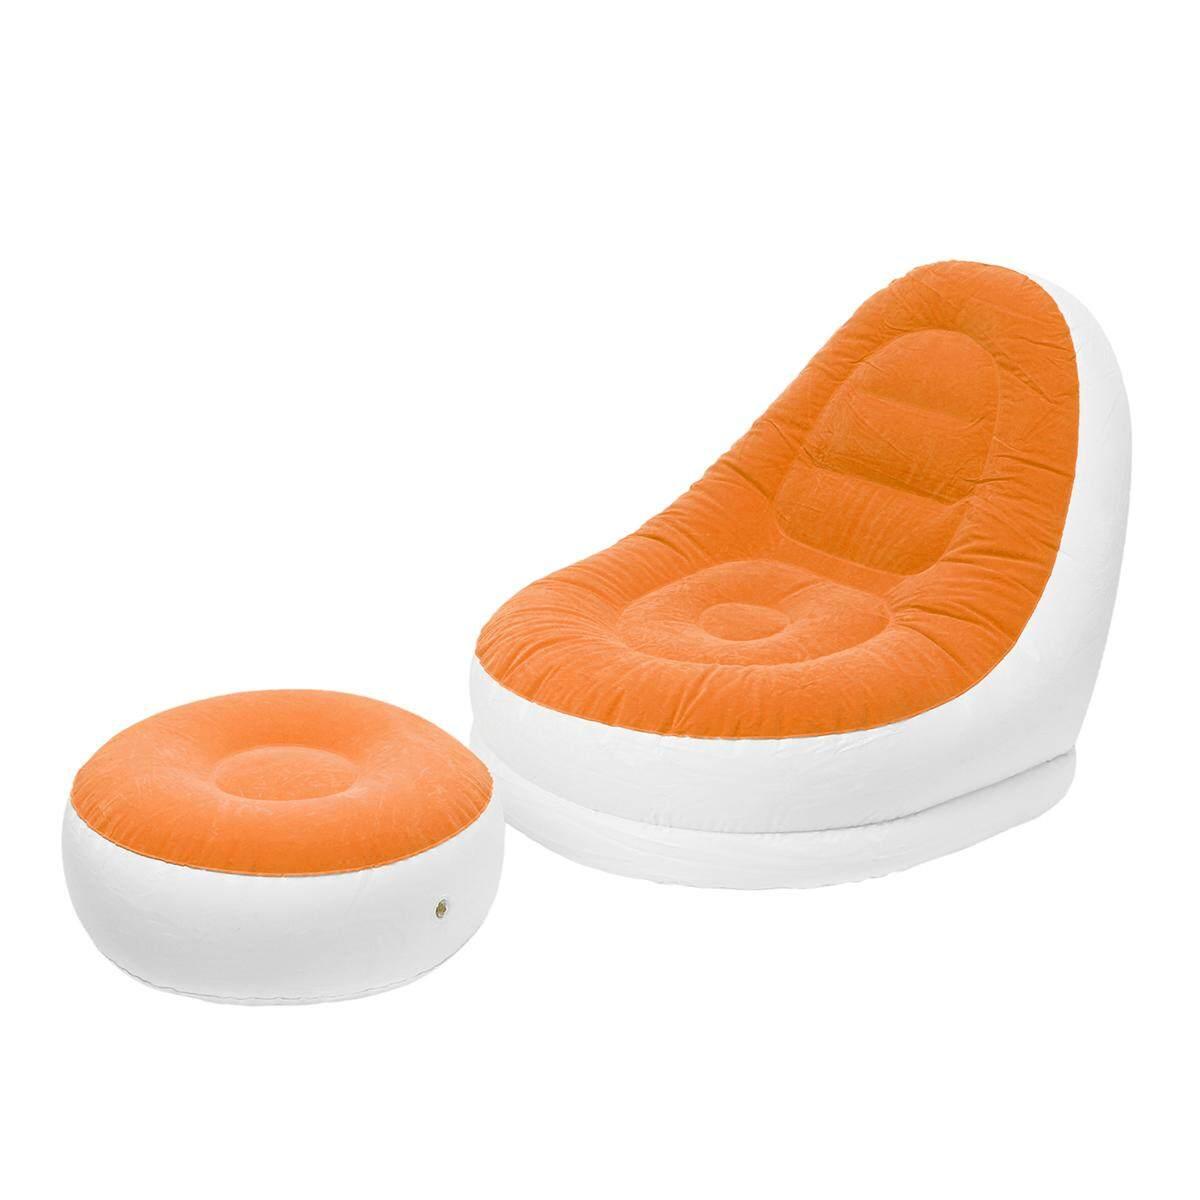 Intex Inflatable Sofa Chair Adult Bean Bag Soft Light Beanless Camping Seat New#Orange - intl